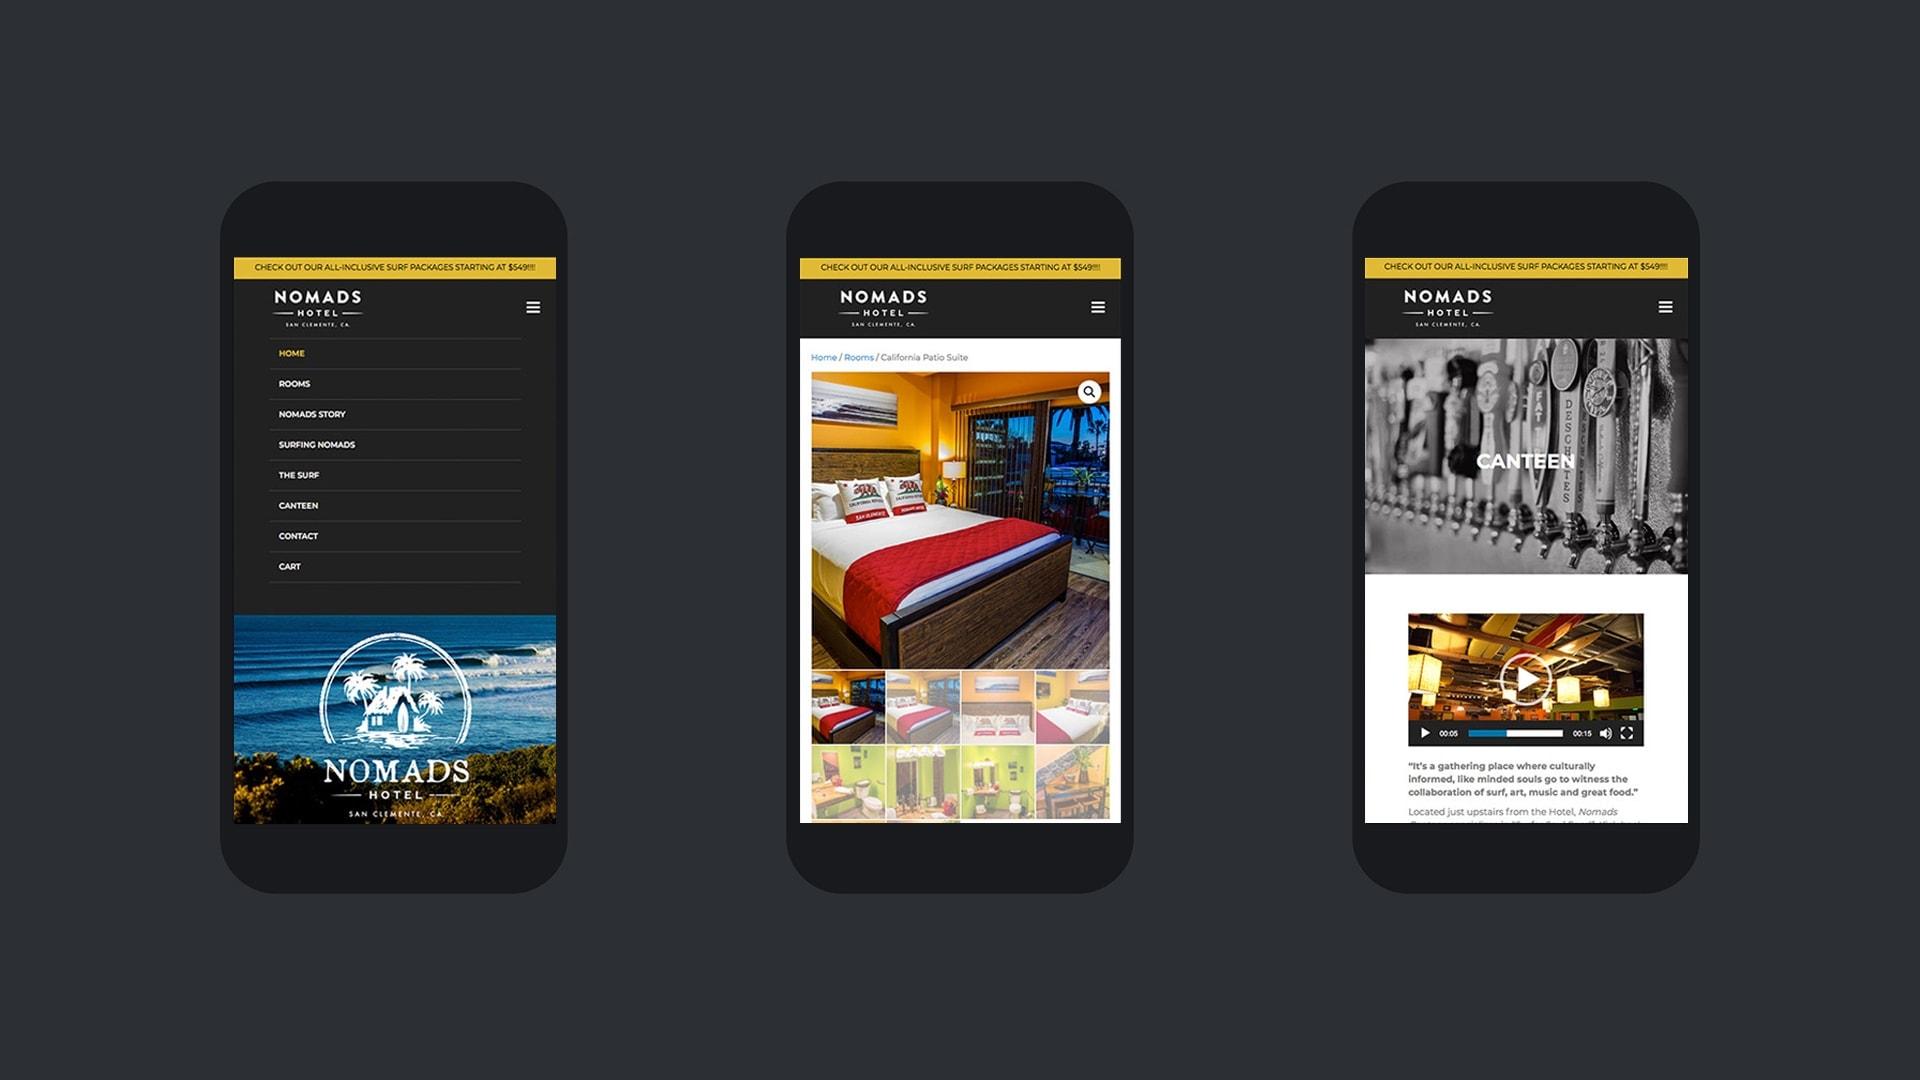 Nomads Hotel San Clemente - Unsung Studio Website Design